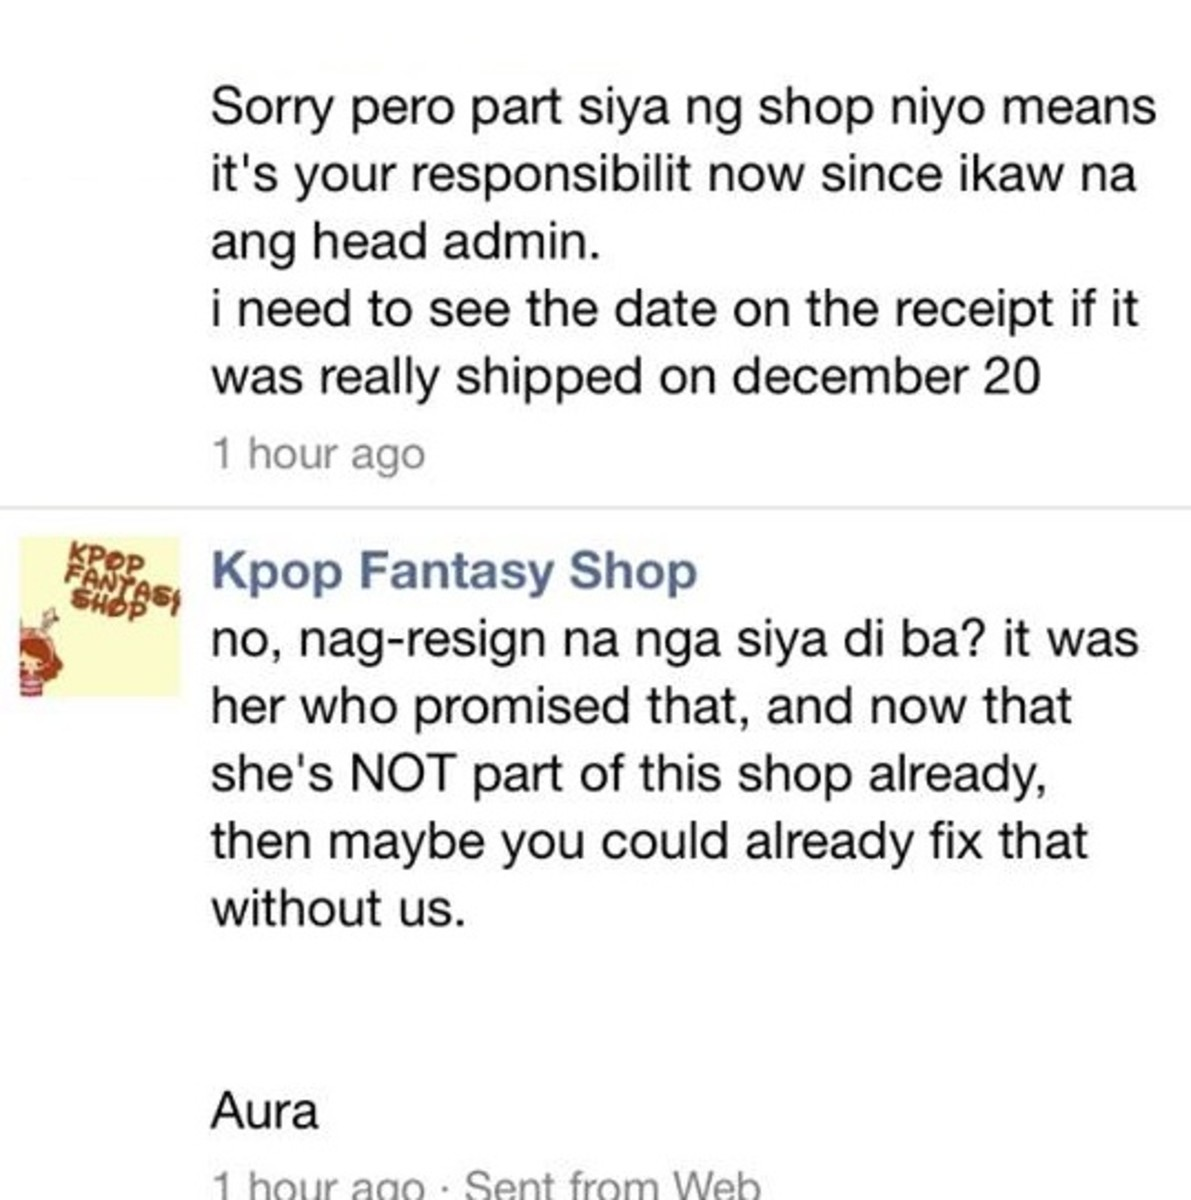 kpop-fantasy-shop-review-epitome-of-bad-online-selling